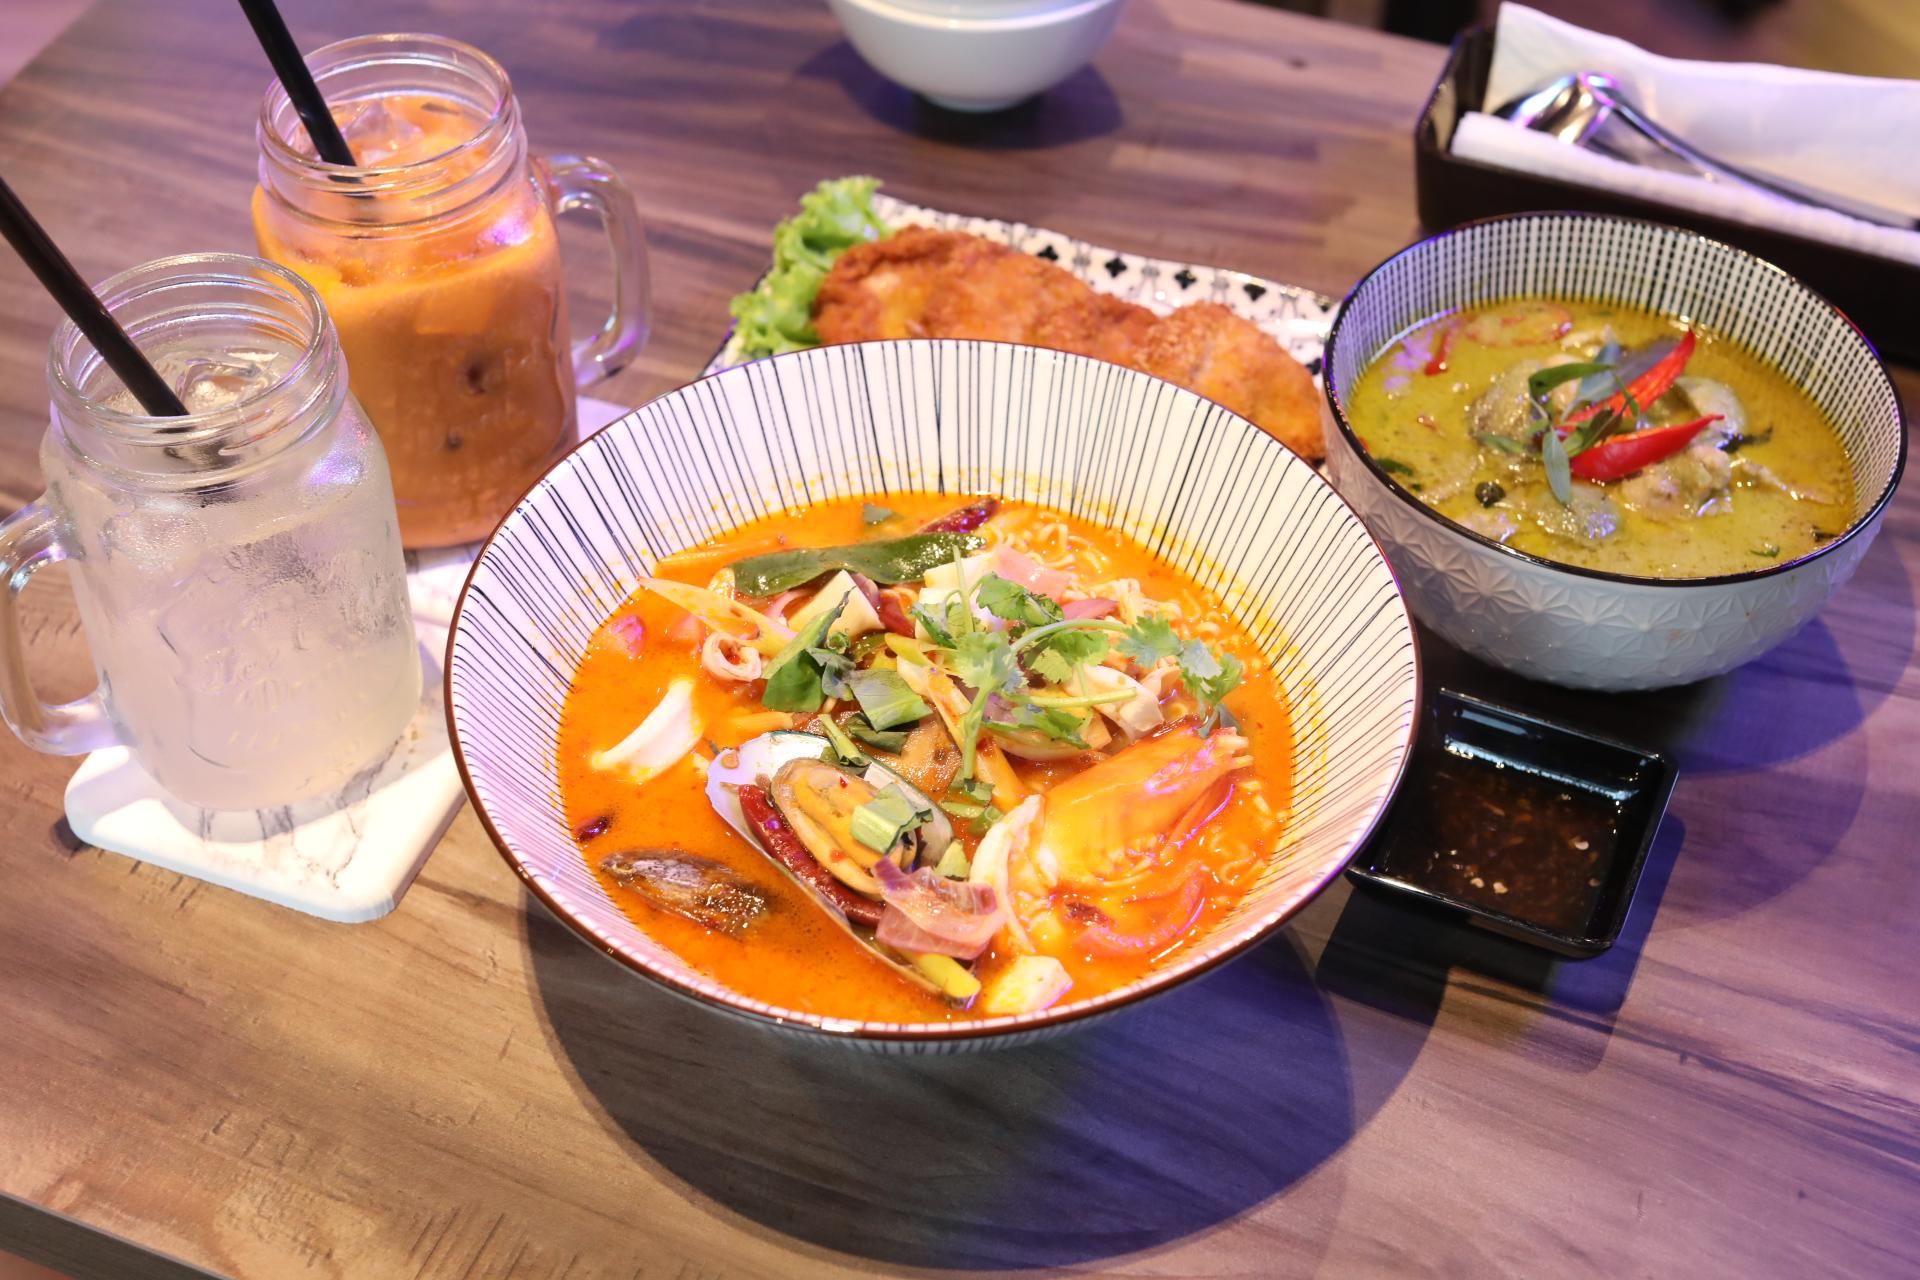 Suk S Thai Kitchen Modern Thai Restaurant With Tom Yum Mama And Instagrammable Neon Interior Danielfooddiary Com